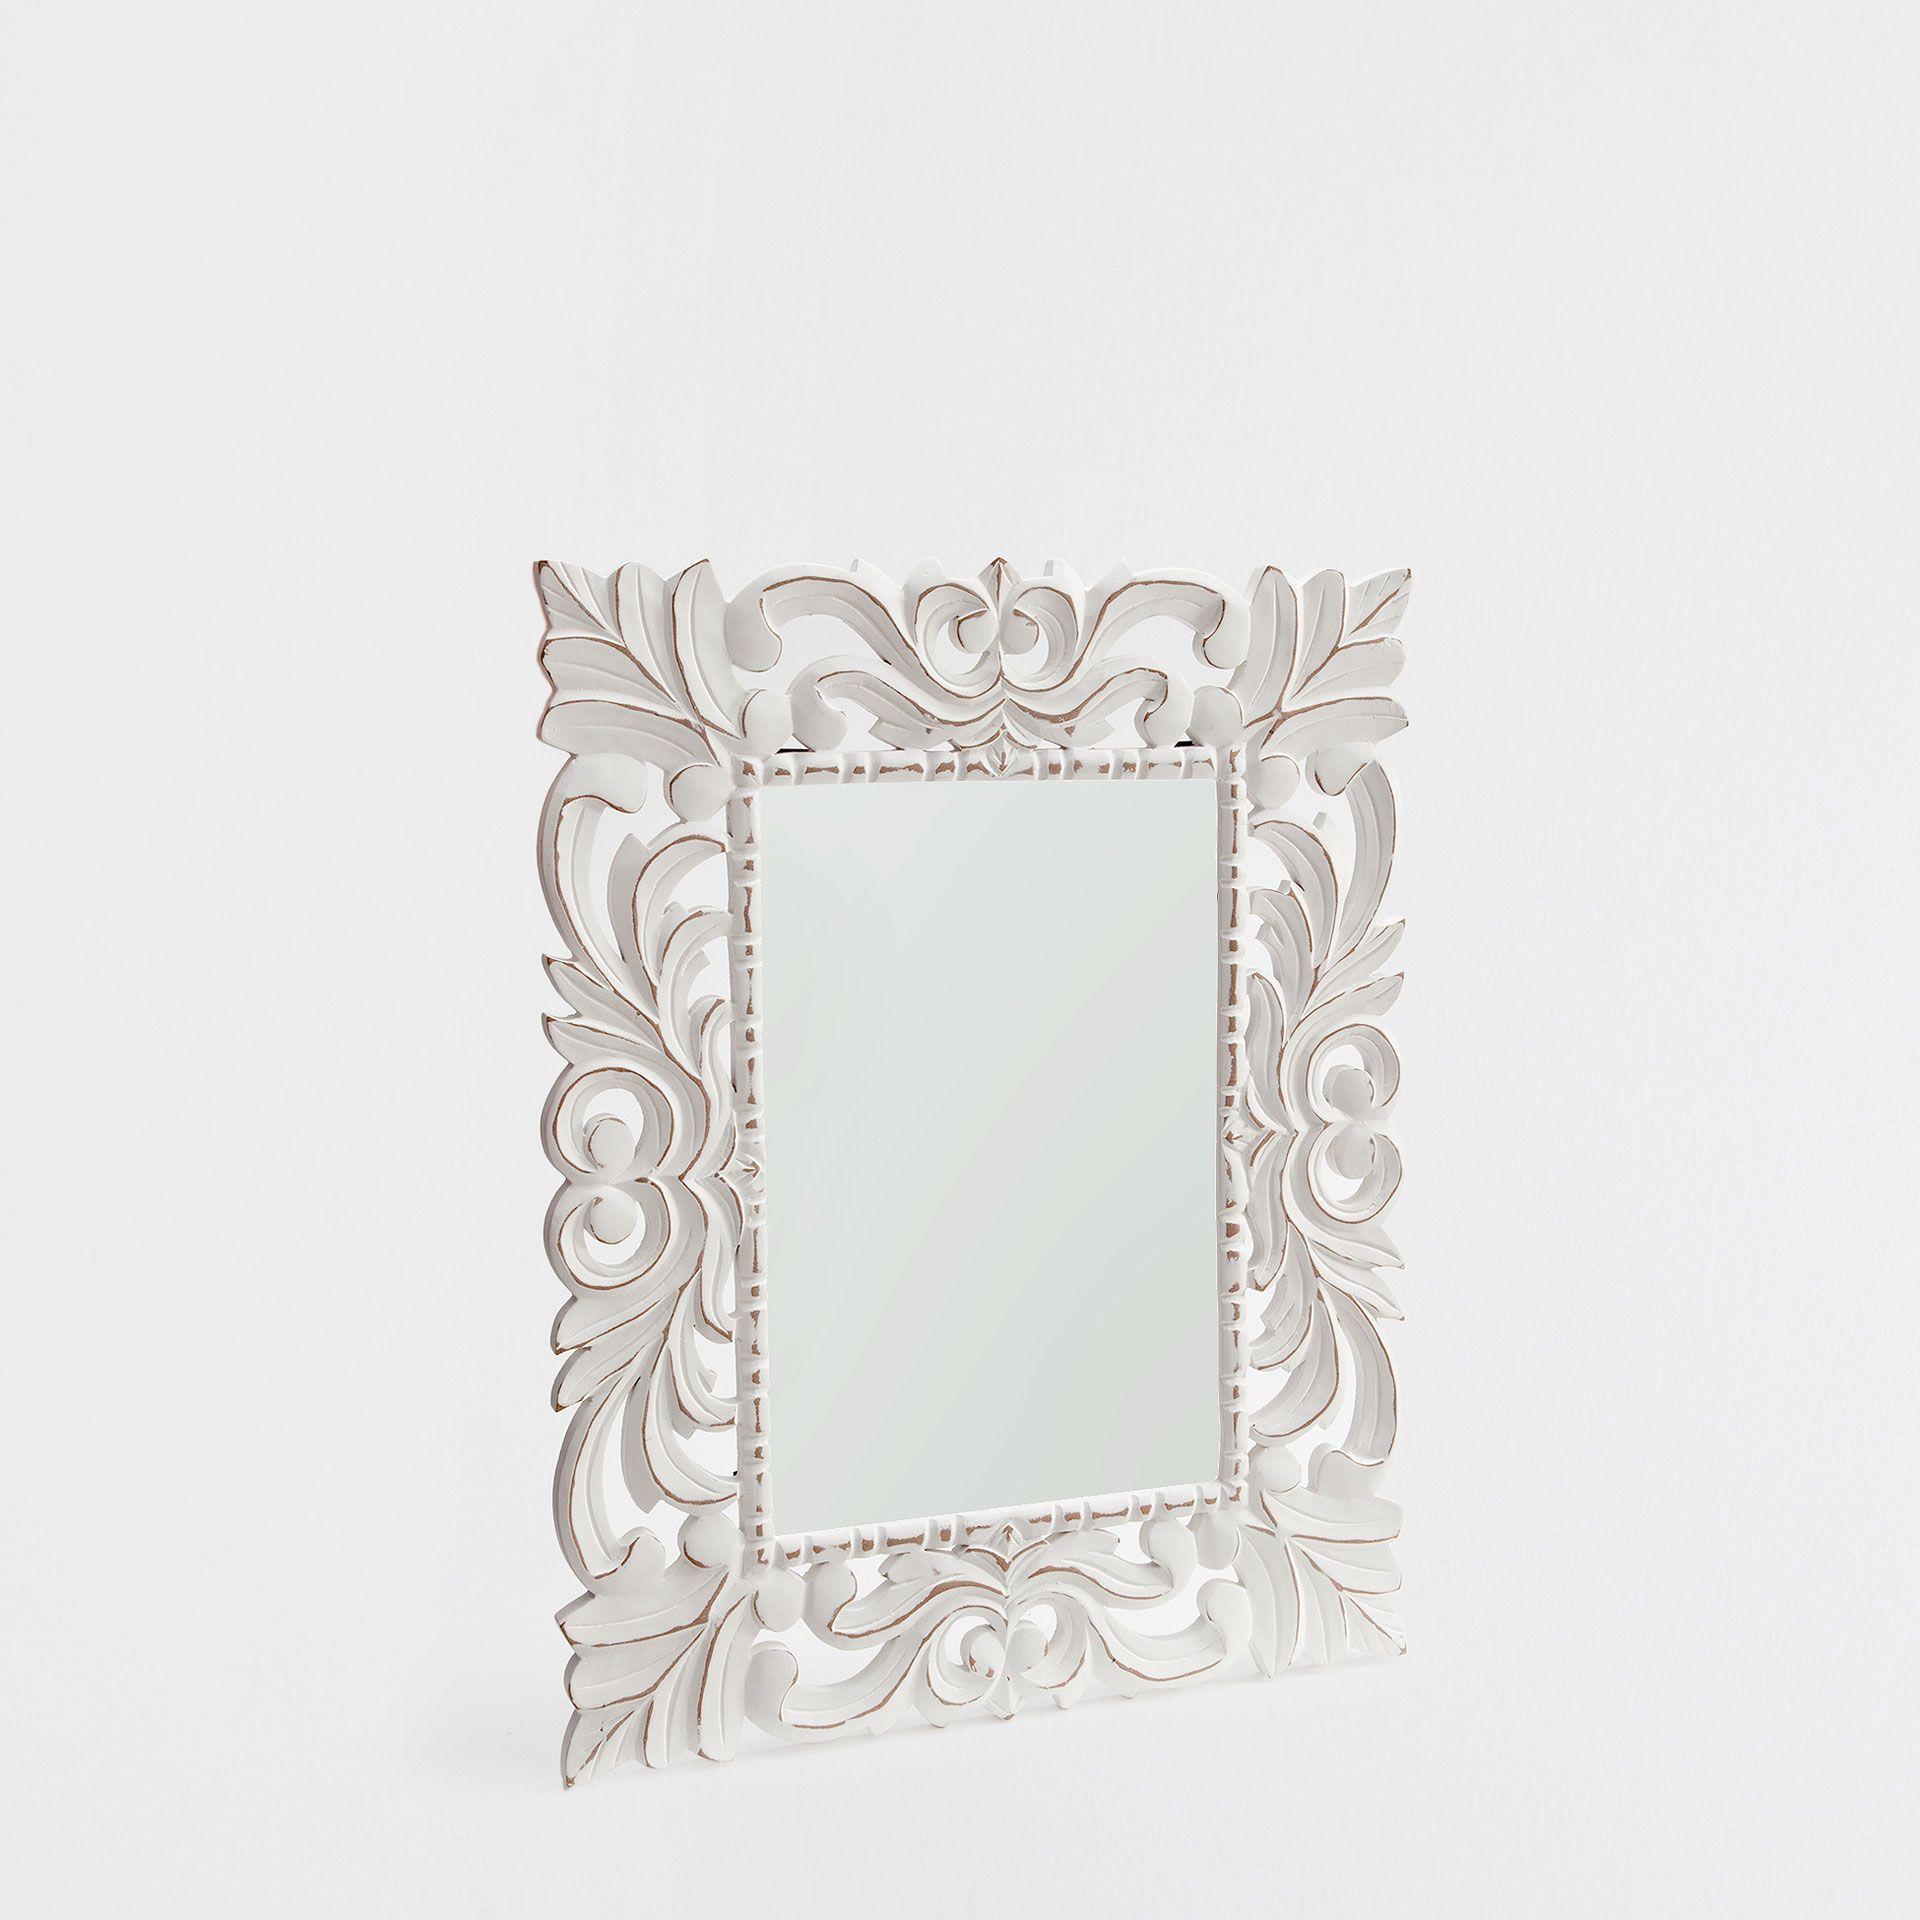 miroir blanc bois ajour miroirs d coration zara